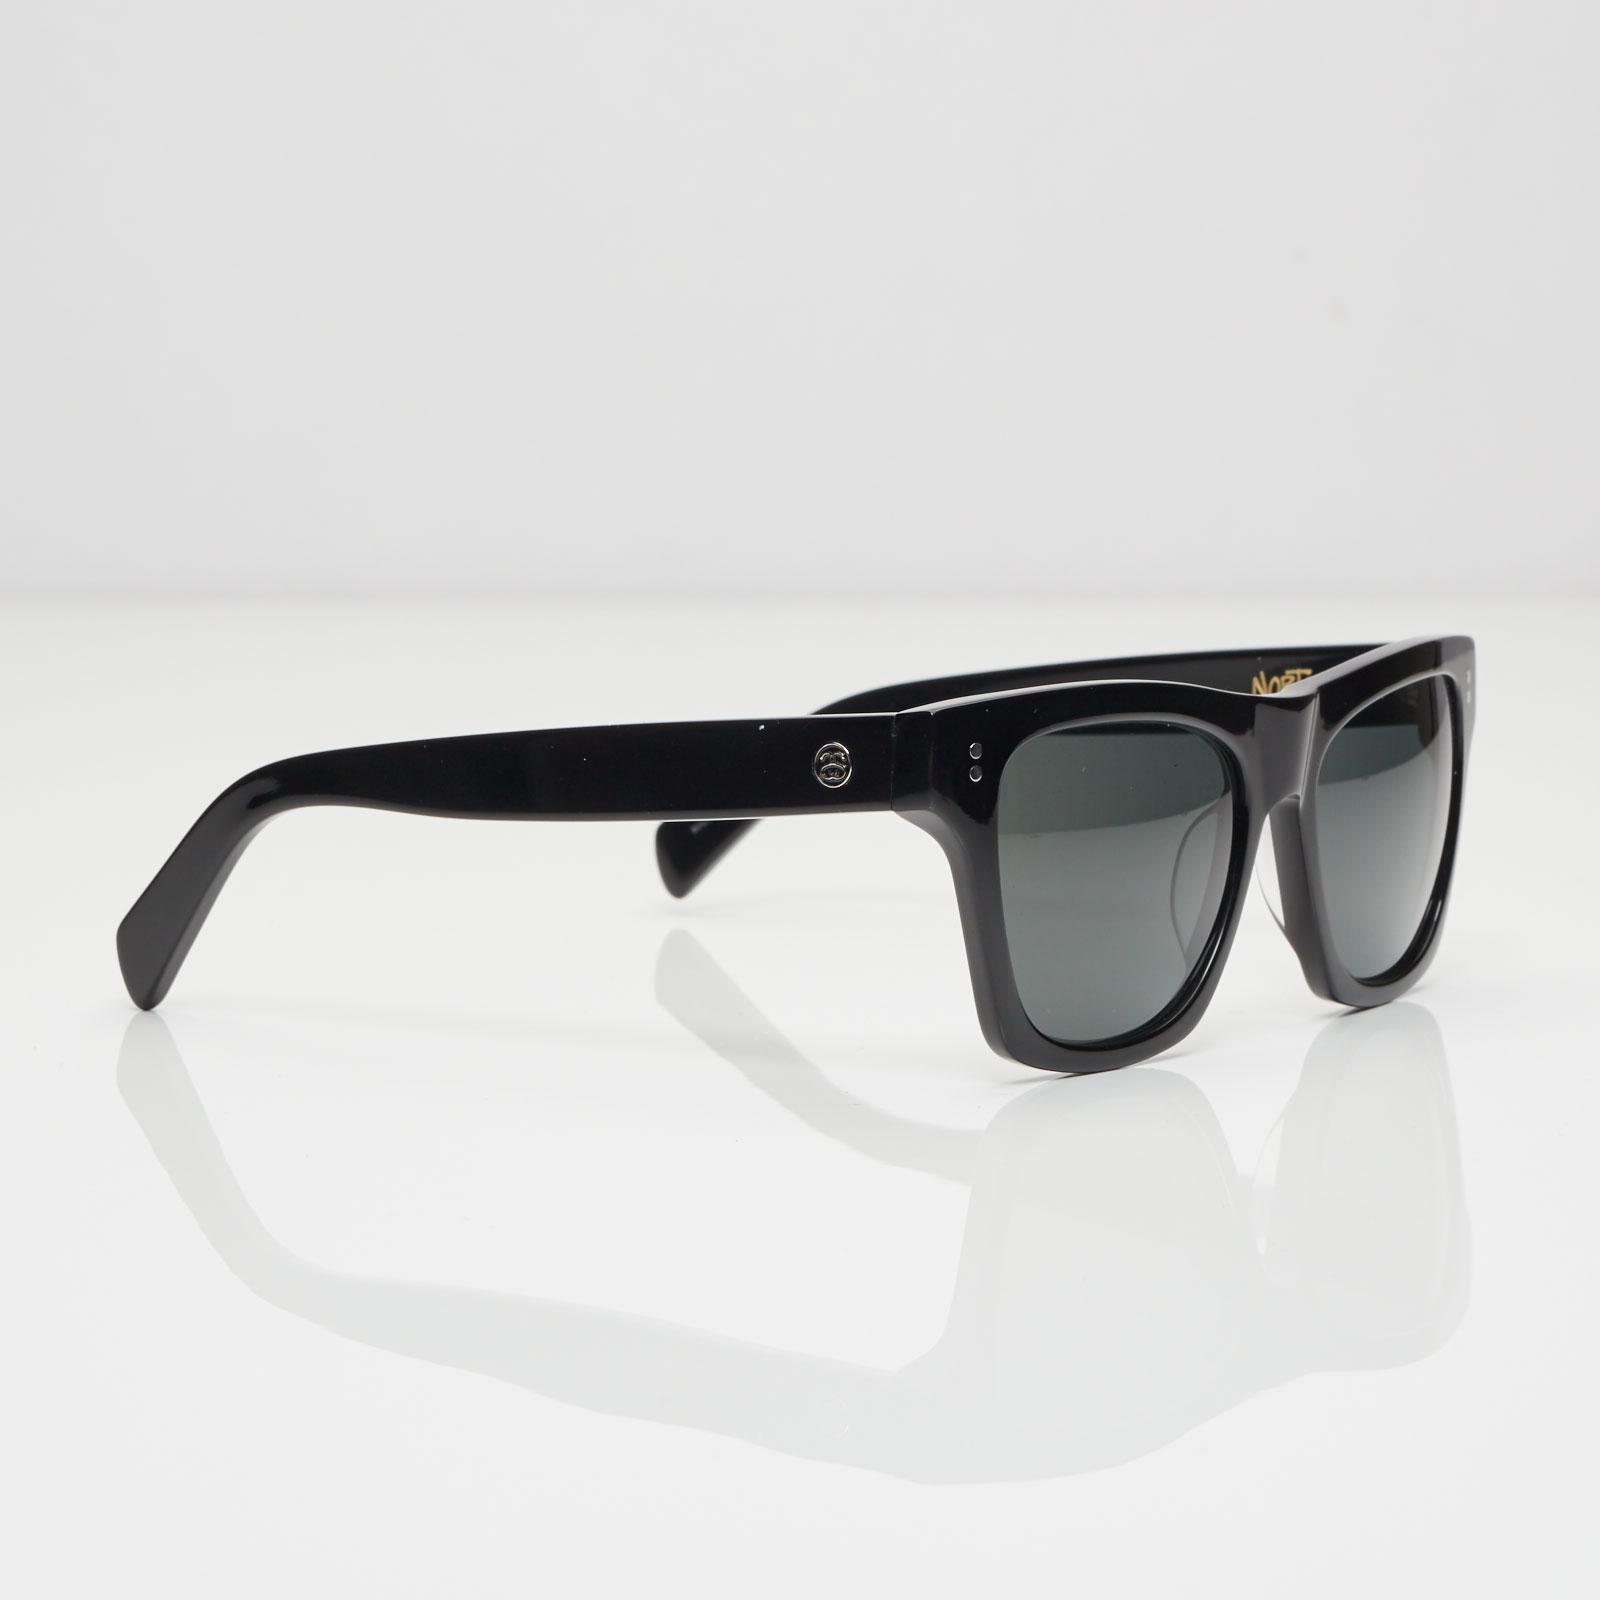 4cef6f6b32 Stussy Norton Sunglasses - 140012-997 - Sneakersnstuff